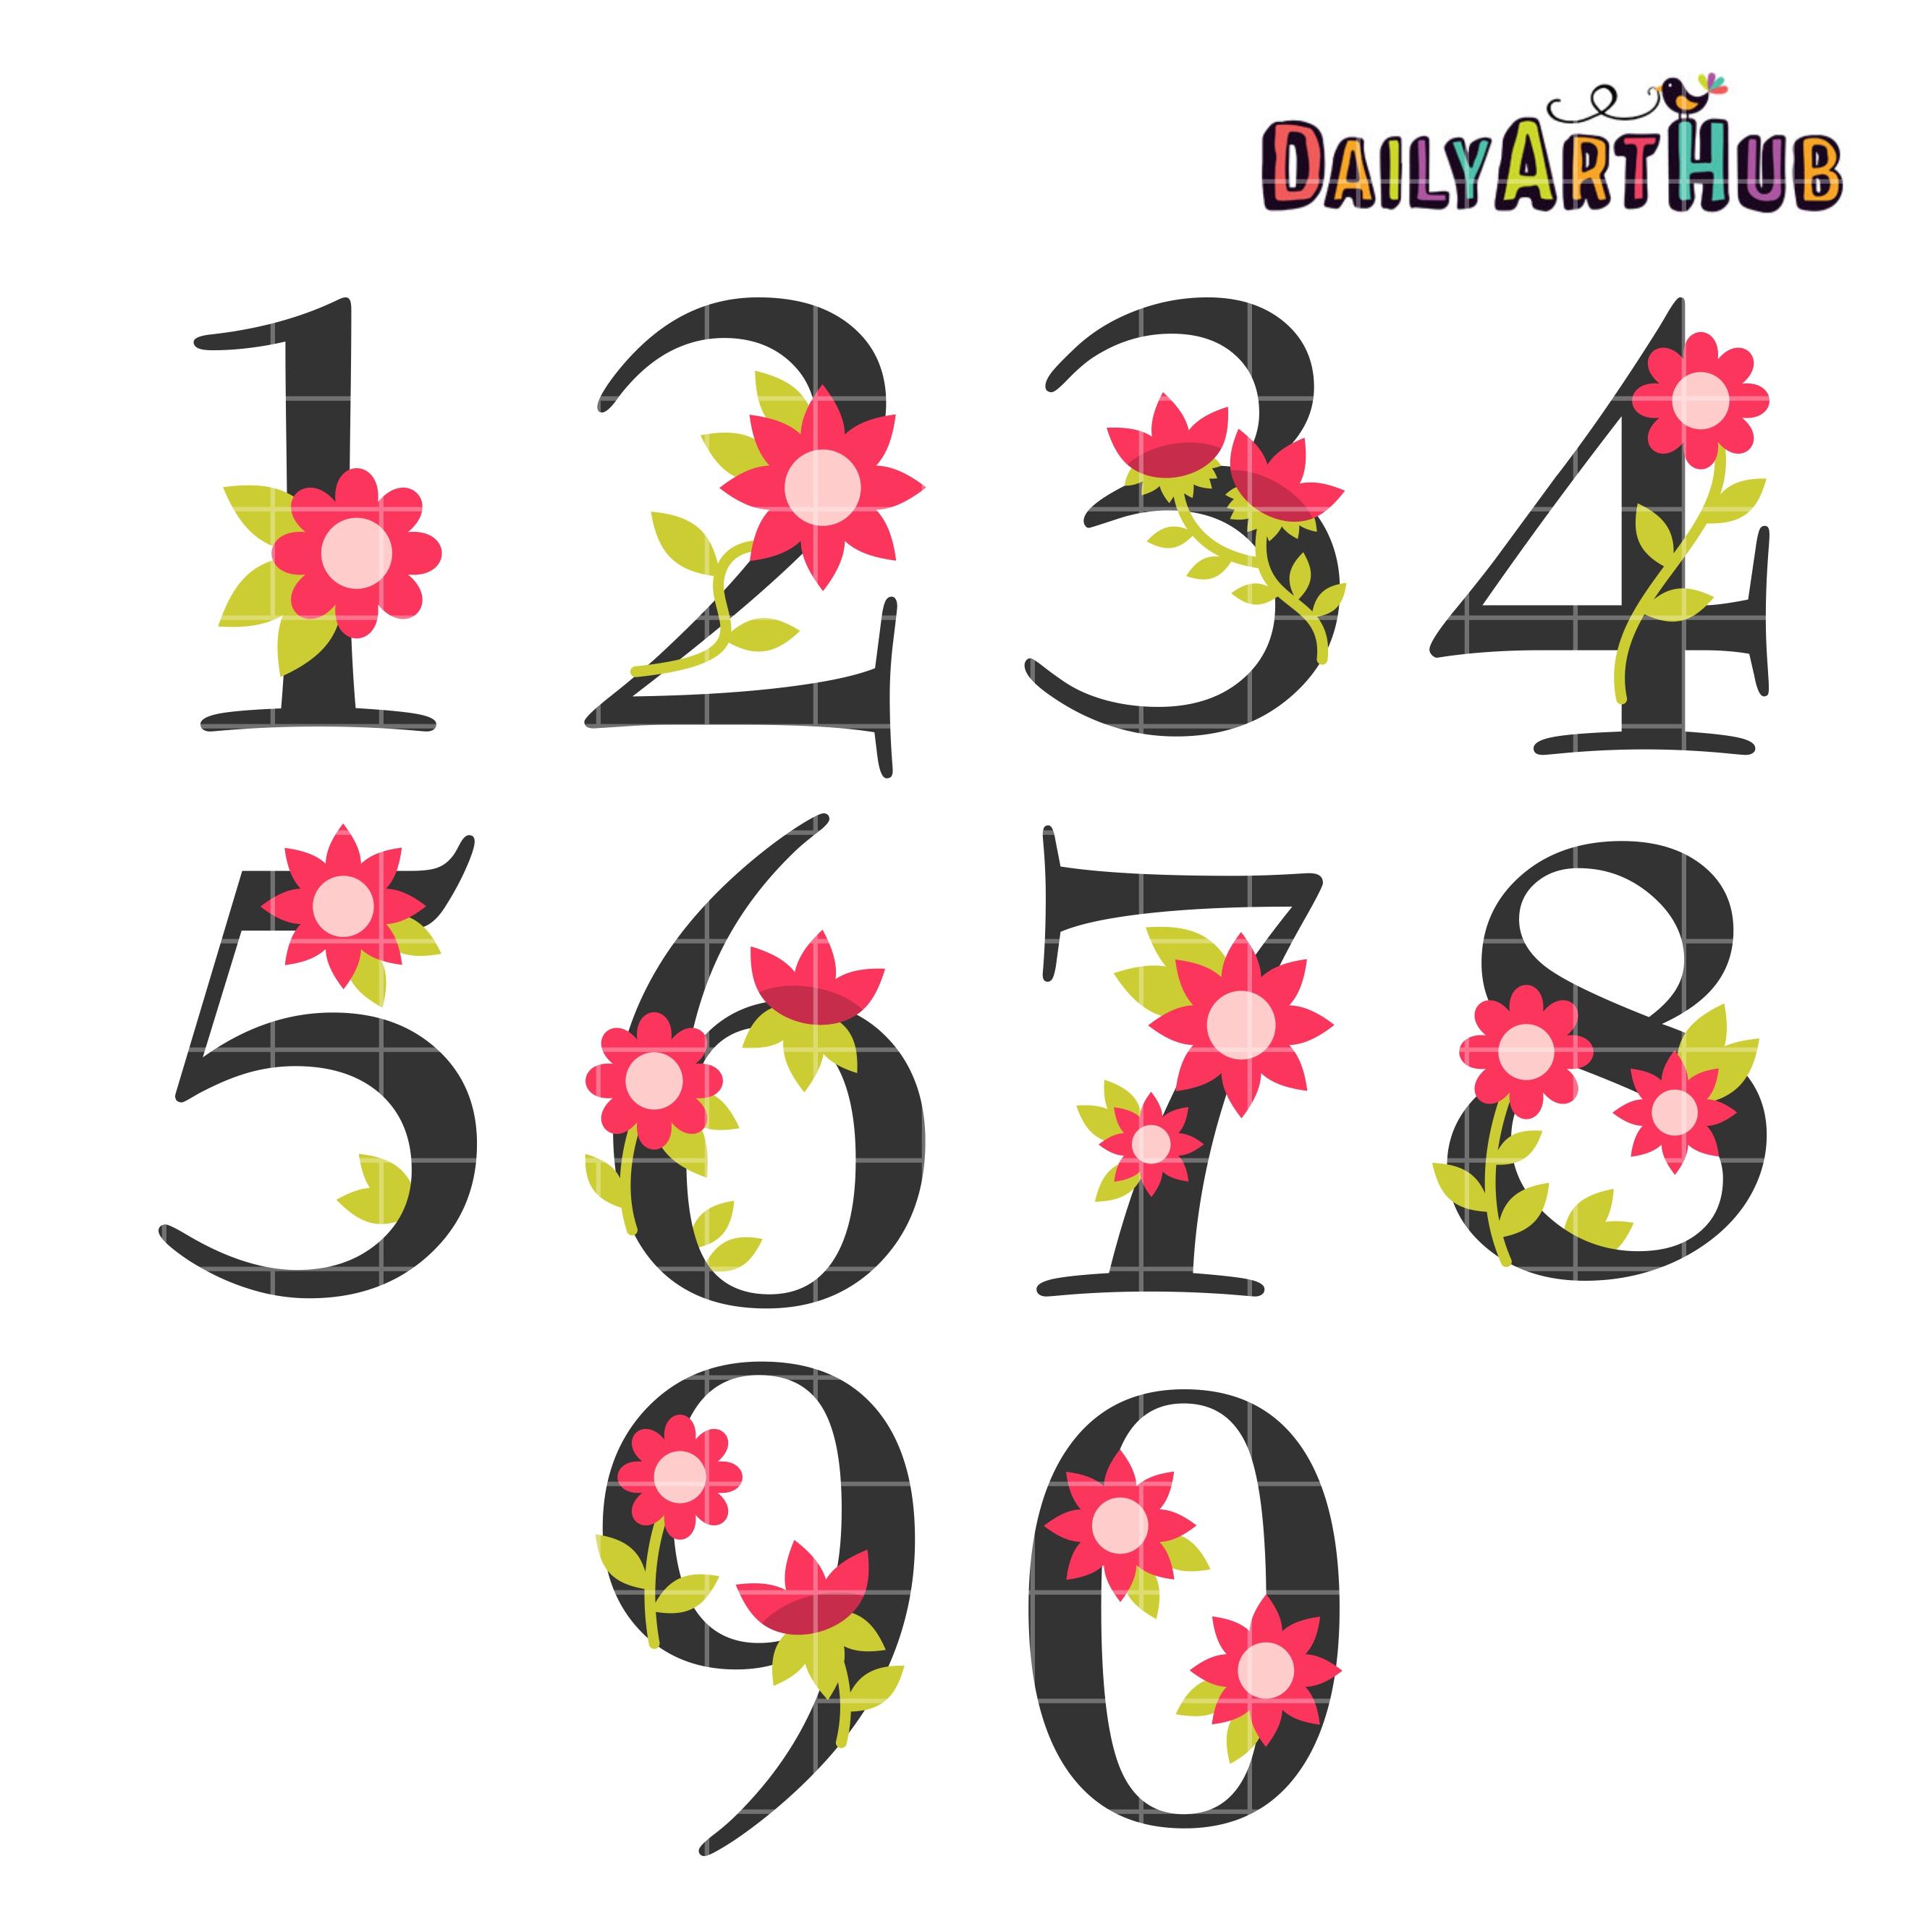 2664x2670 Flower Numbers Clip Art Set Daily Art Hub